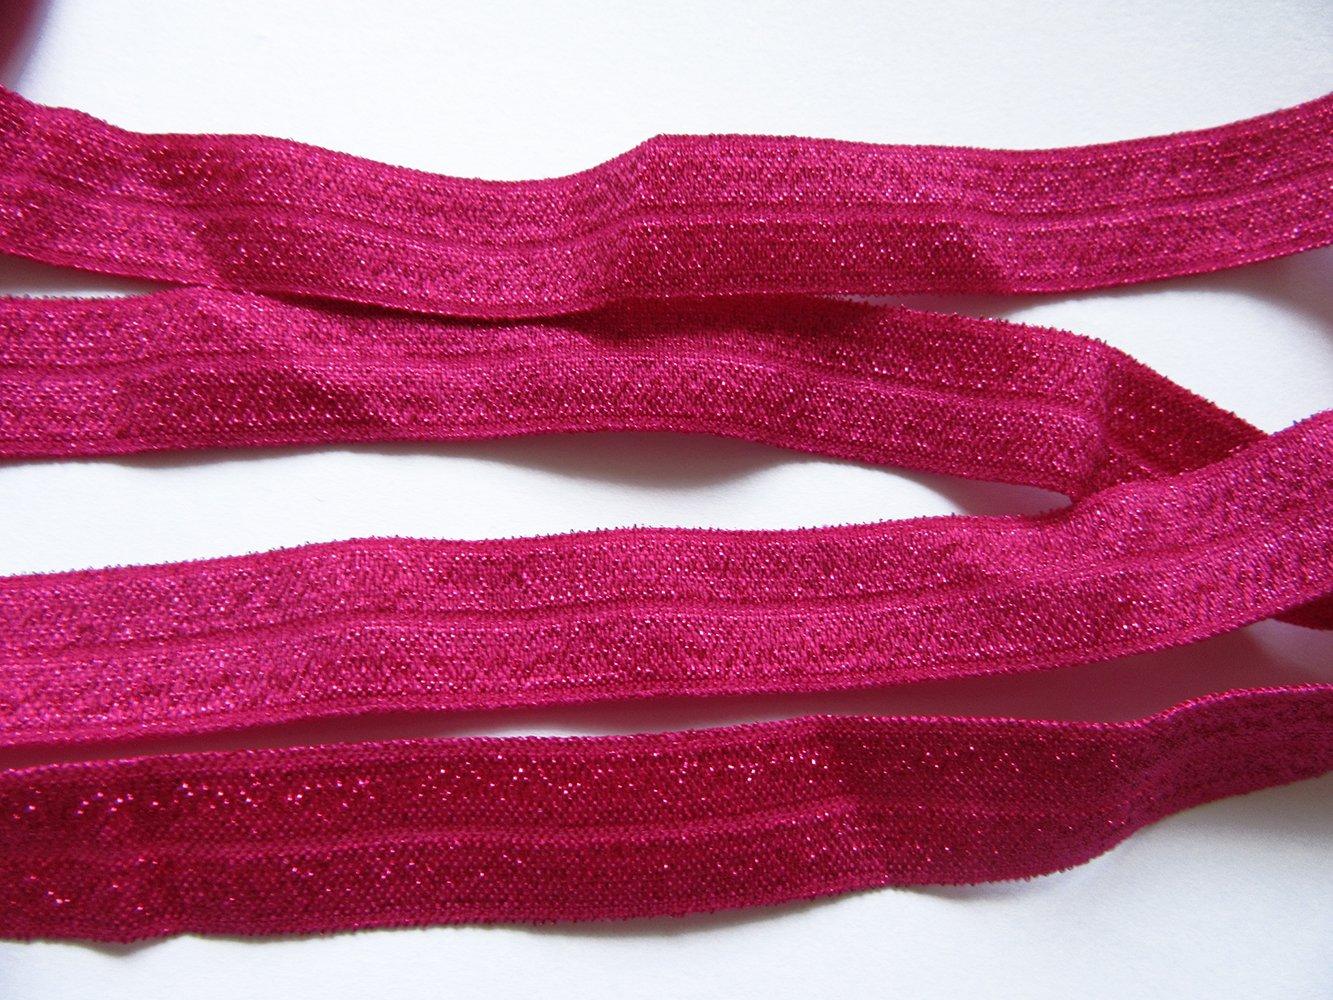 Silver YYCRAFT 5//8 15 yards Glitter Fold Over Elastic Stretch Foldover FOE Elastics for Hair Ties Headbands